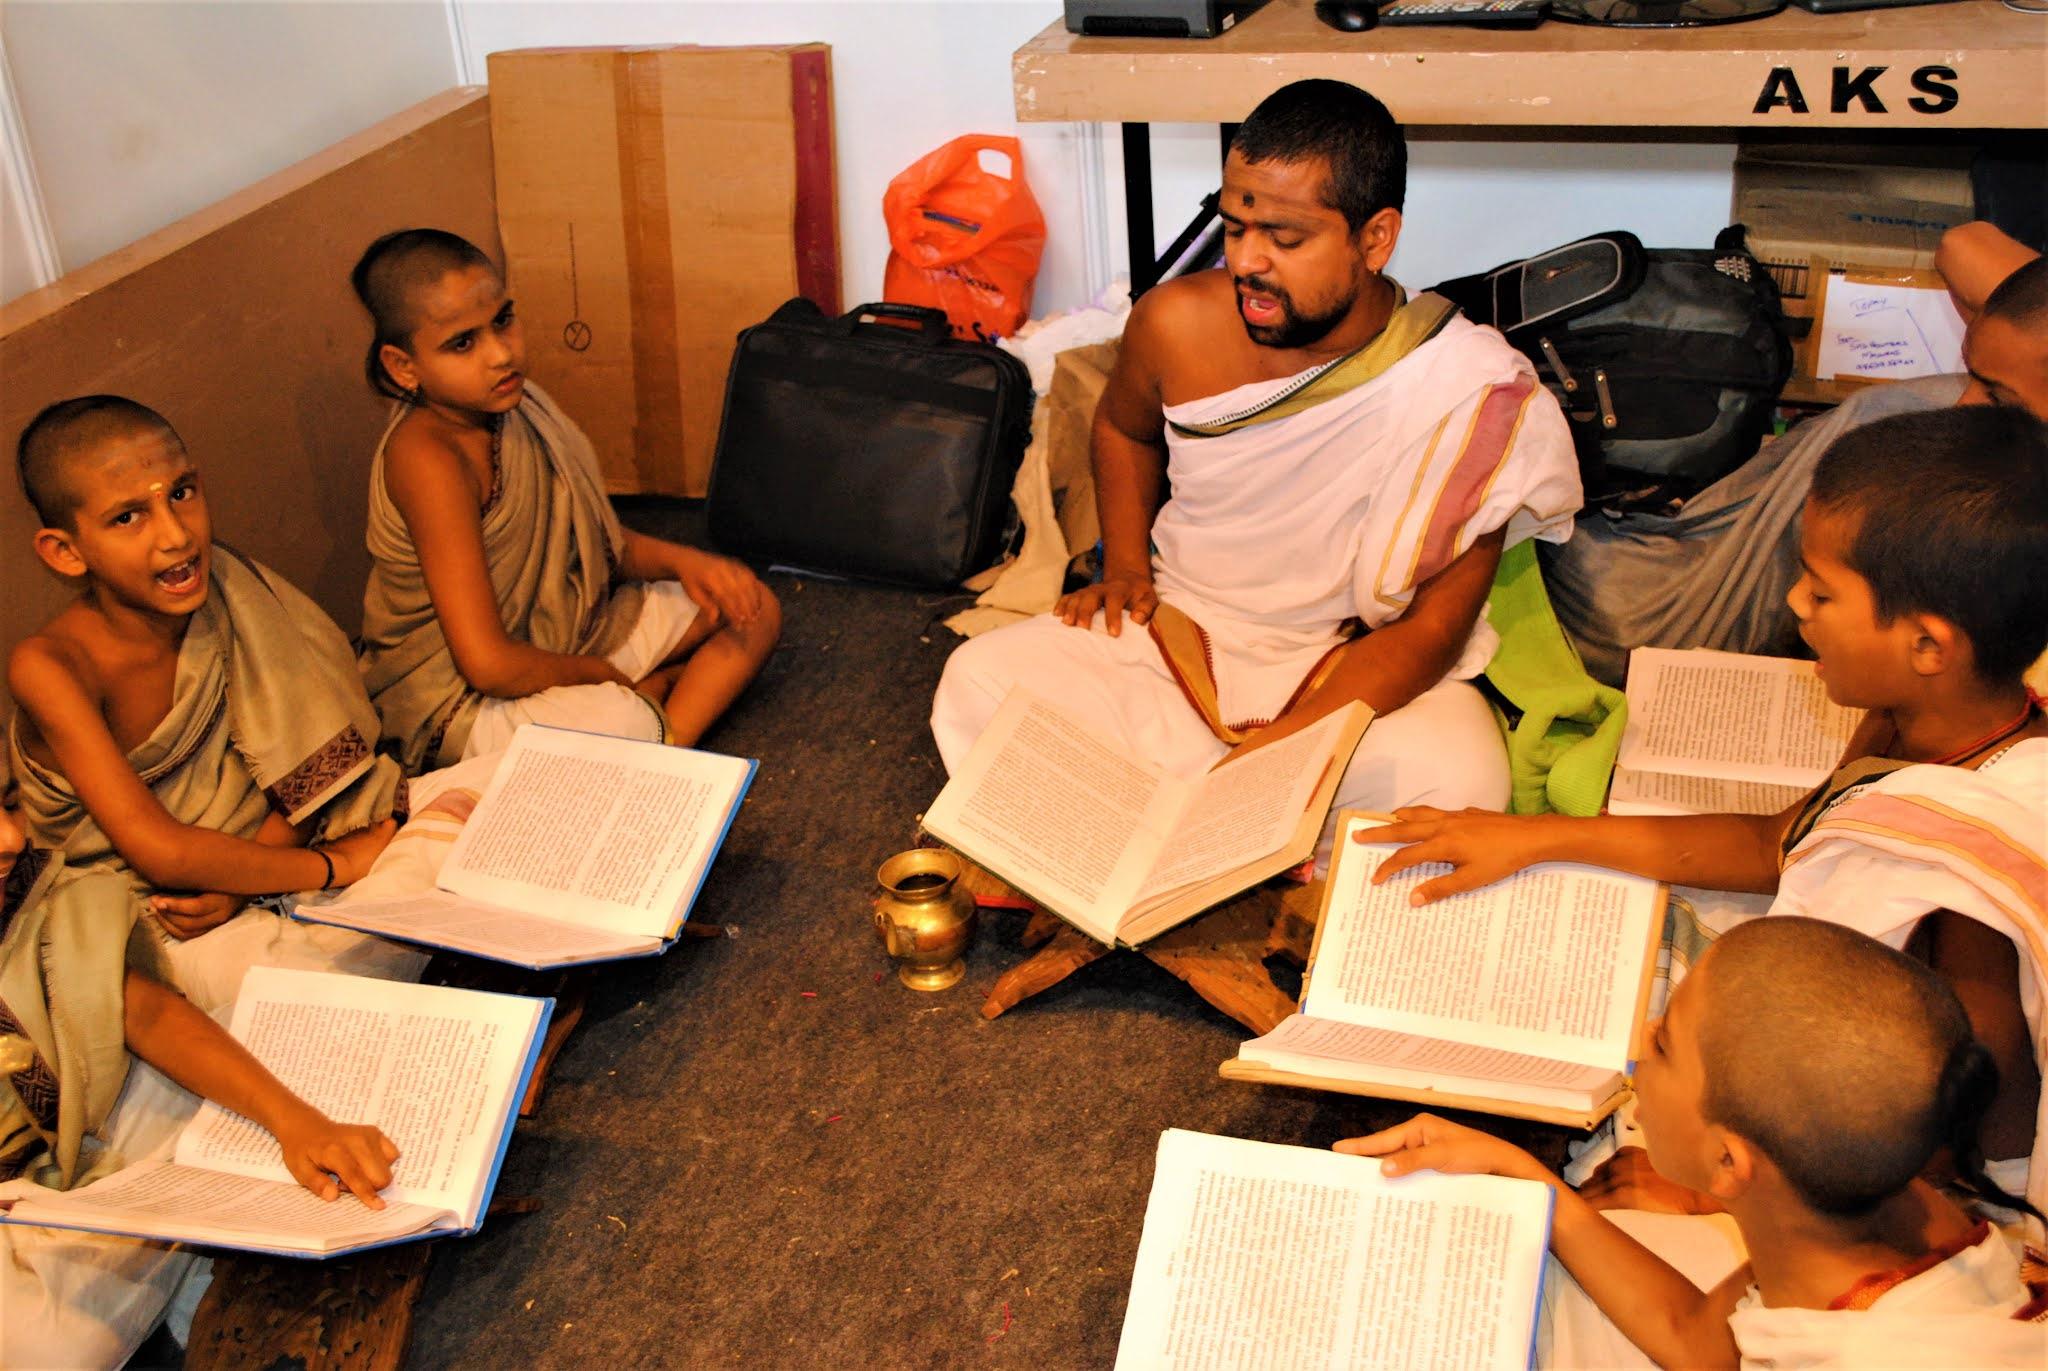 A VILLAGE OF ANCIENT LANGUAGE: MATTUR, KARNATAKA INCREDIBLE AND UNIQUE VILLAGE